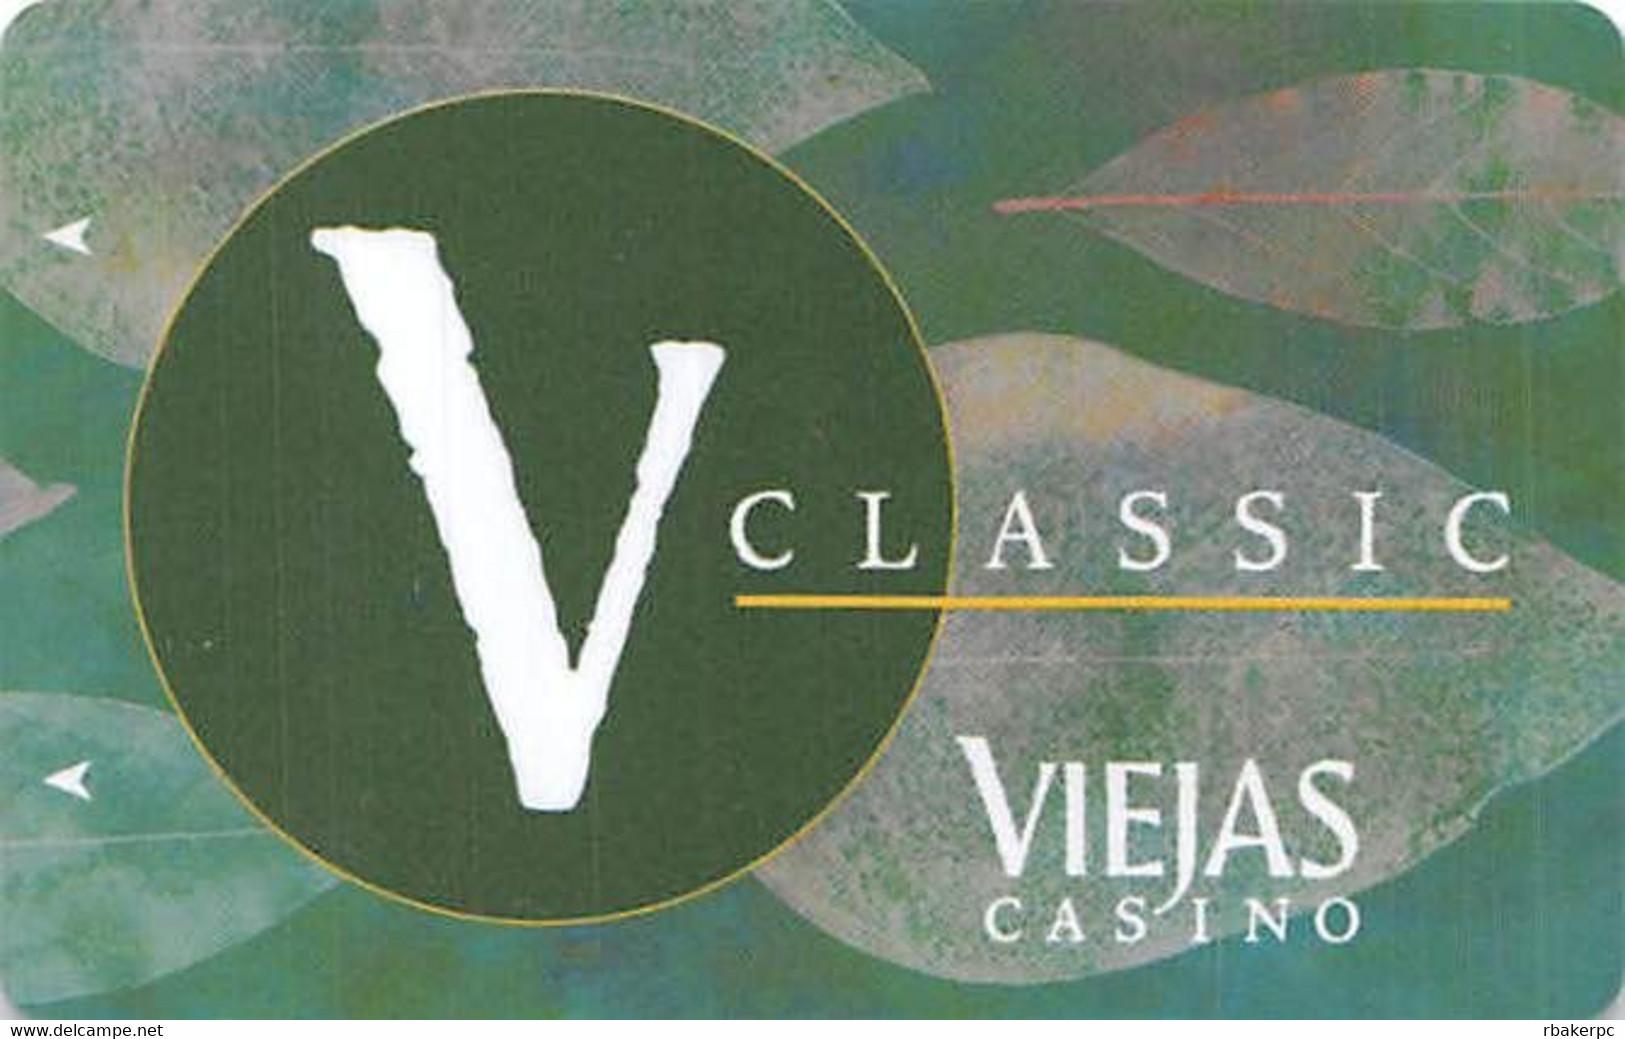 Viejas Casino - Alpine CA - BLANK V Classic Slot Card - No TM In Reverse Logo - Casino Cards